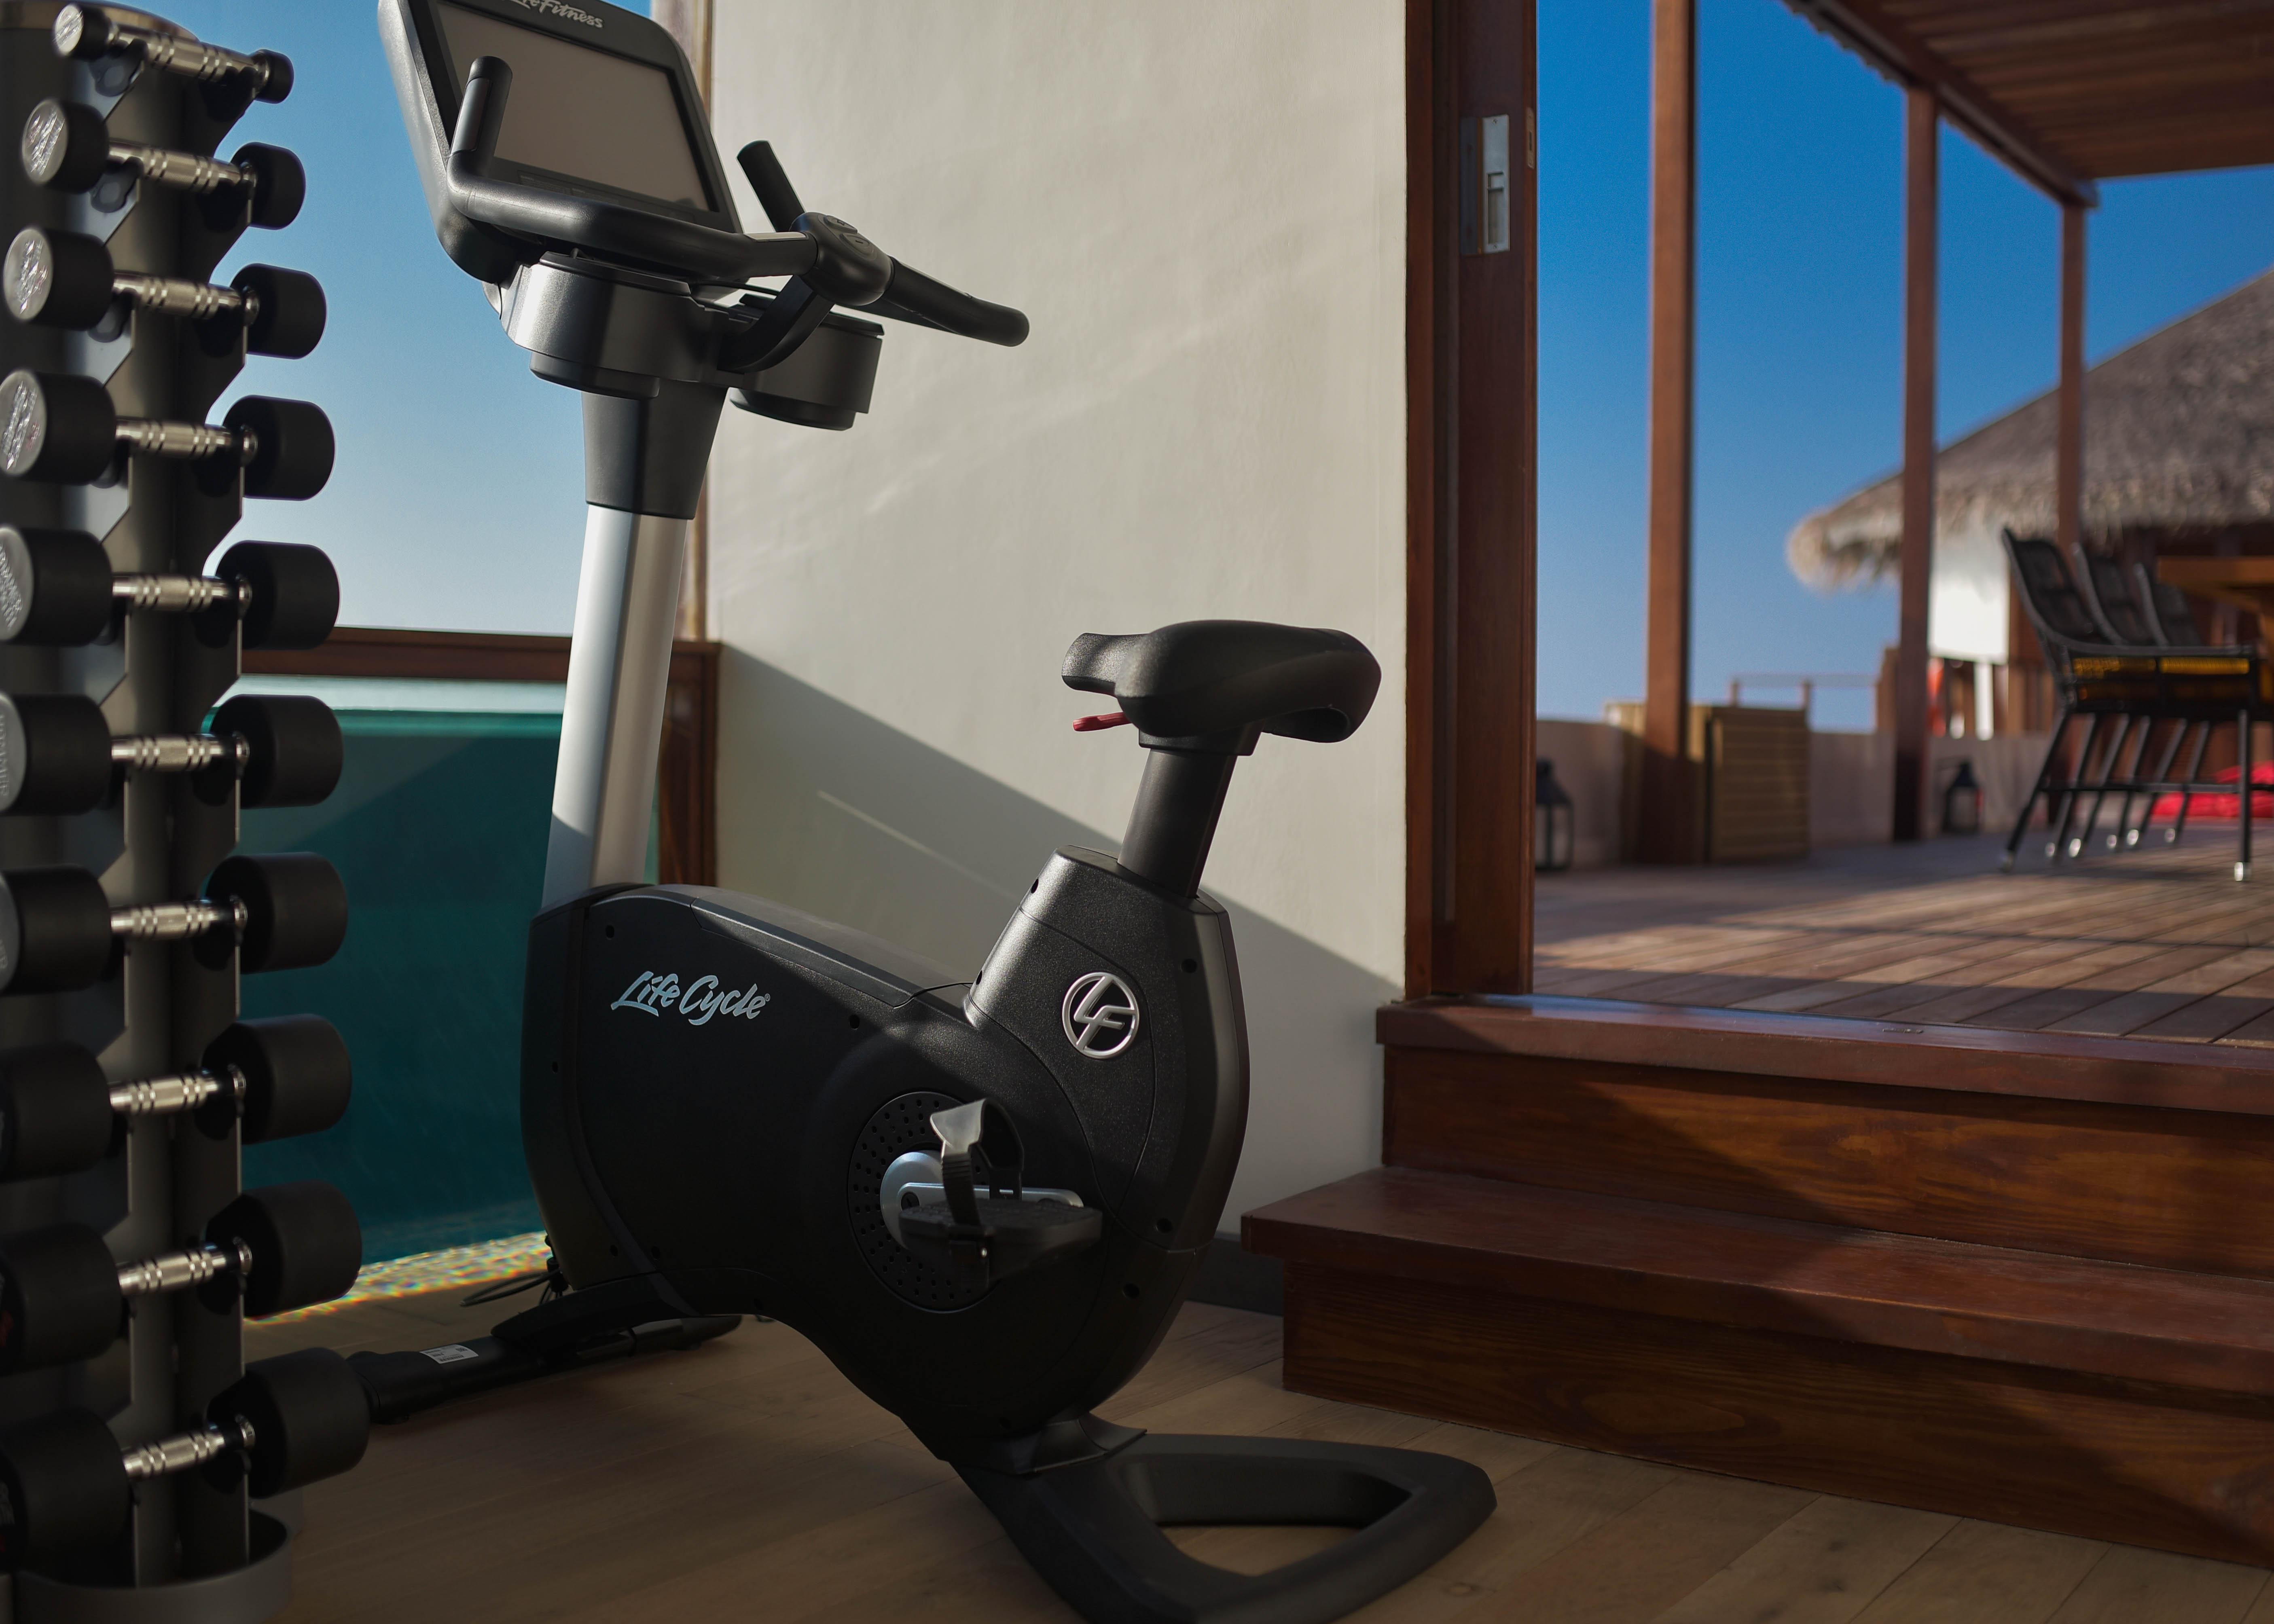 Ozen Water Suite gym